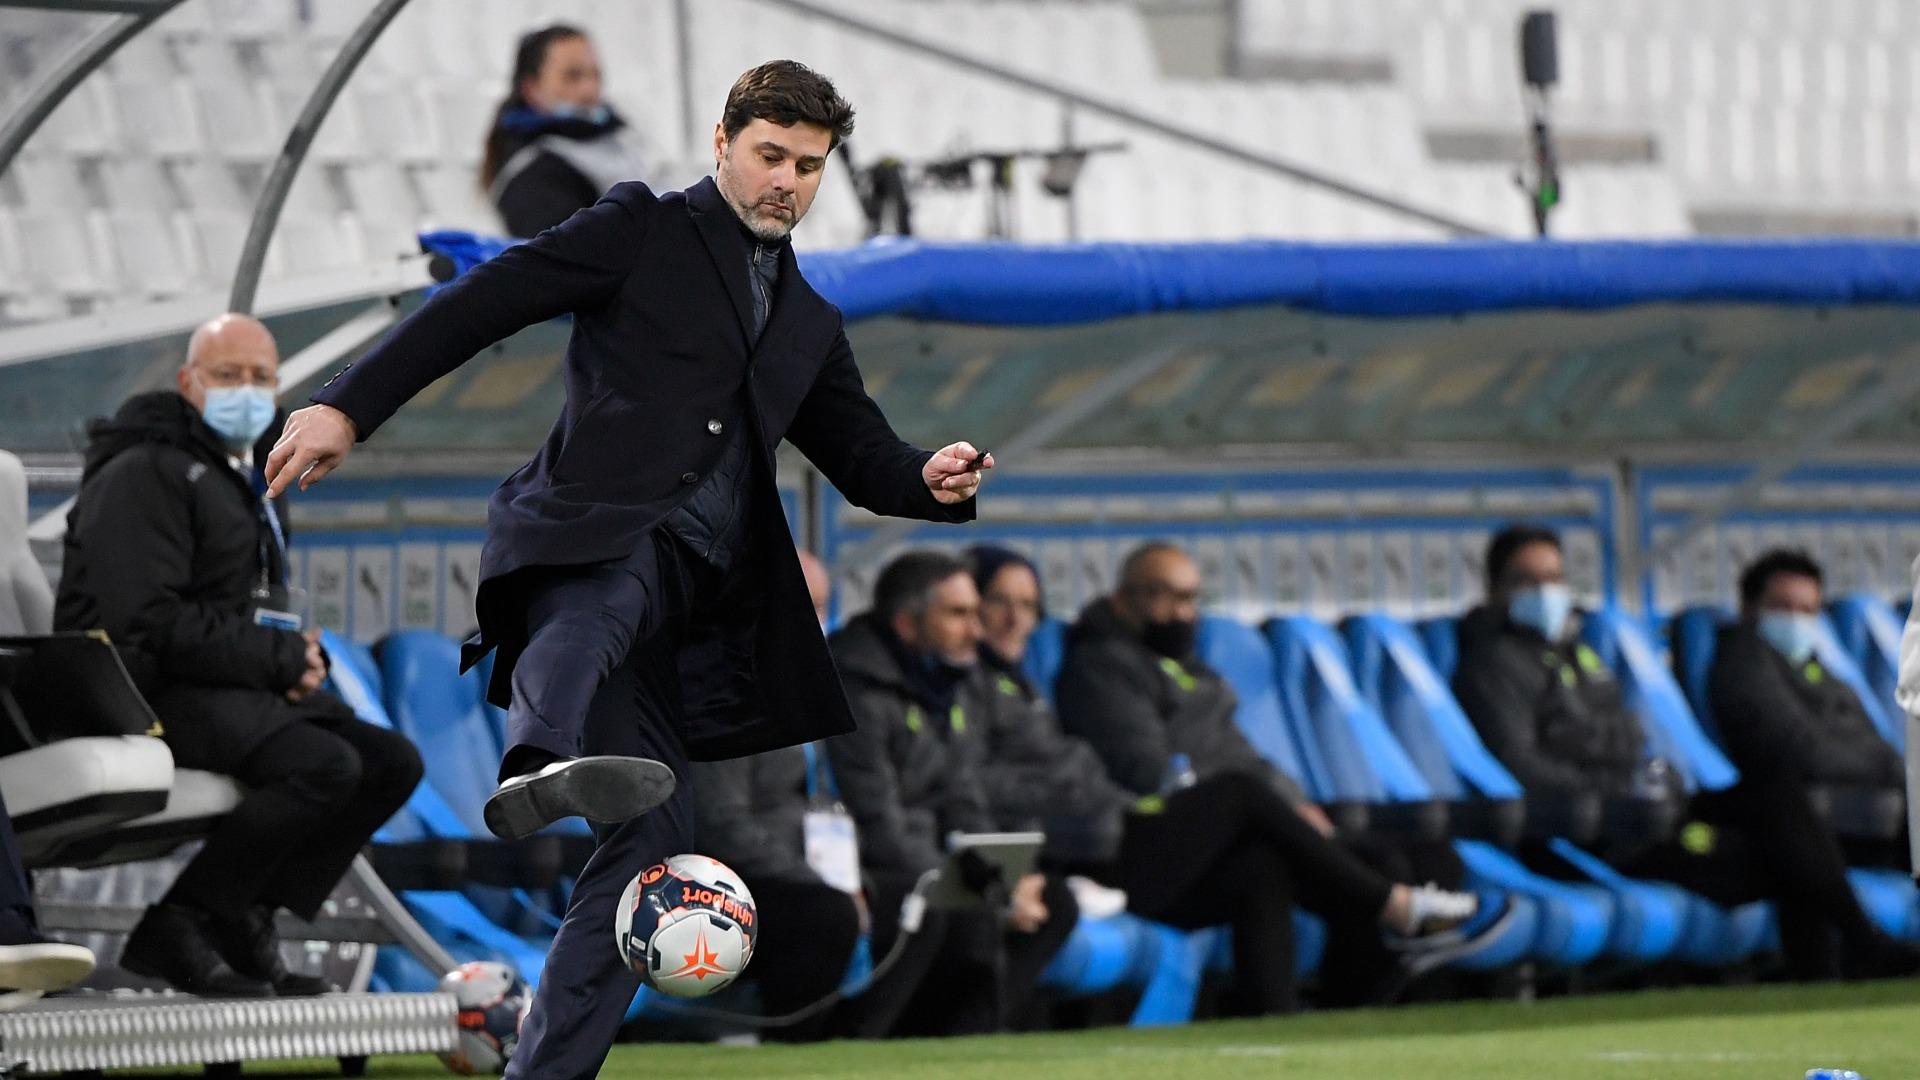 Pochettino misses 'beautiful football' before COVID as 2021 Classique cannot compare